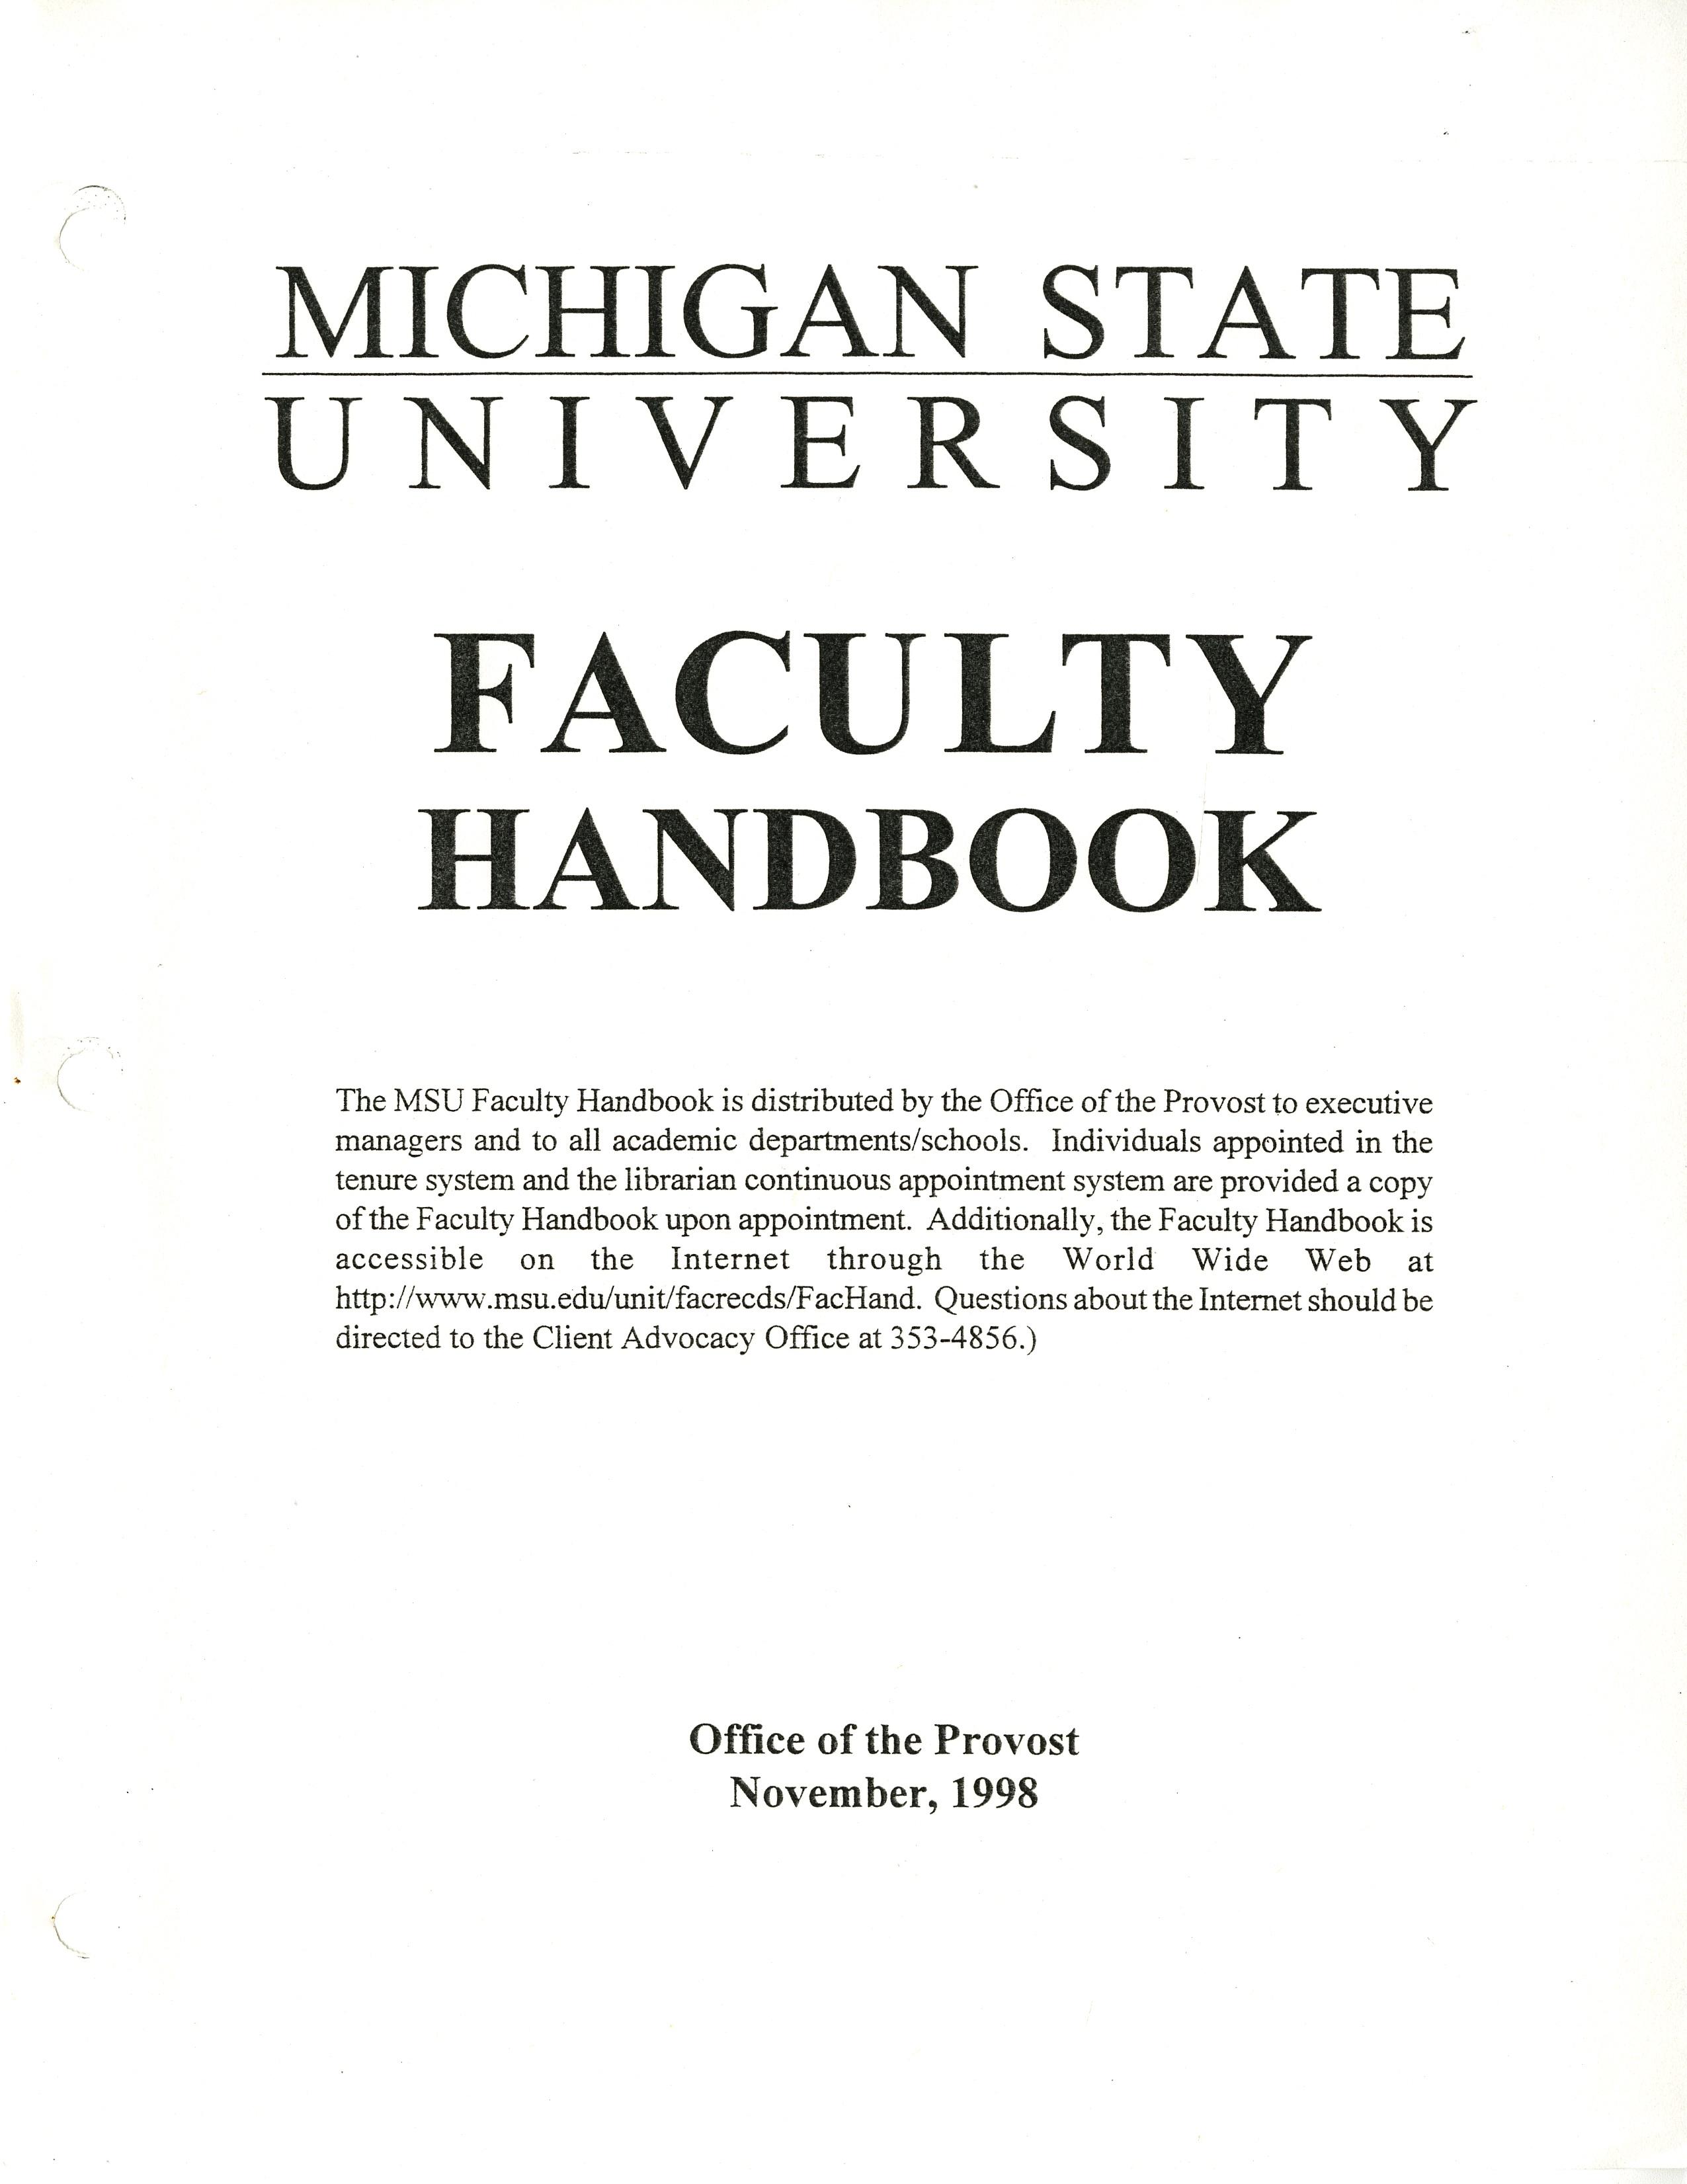 Faculty Handbook, 1998